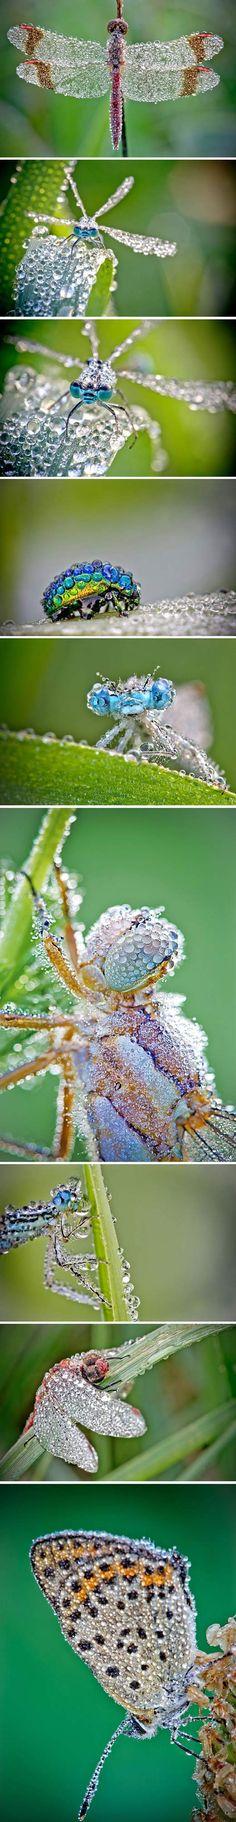 insectes apres la pluie